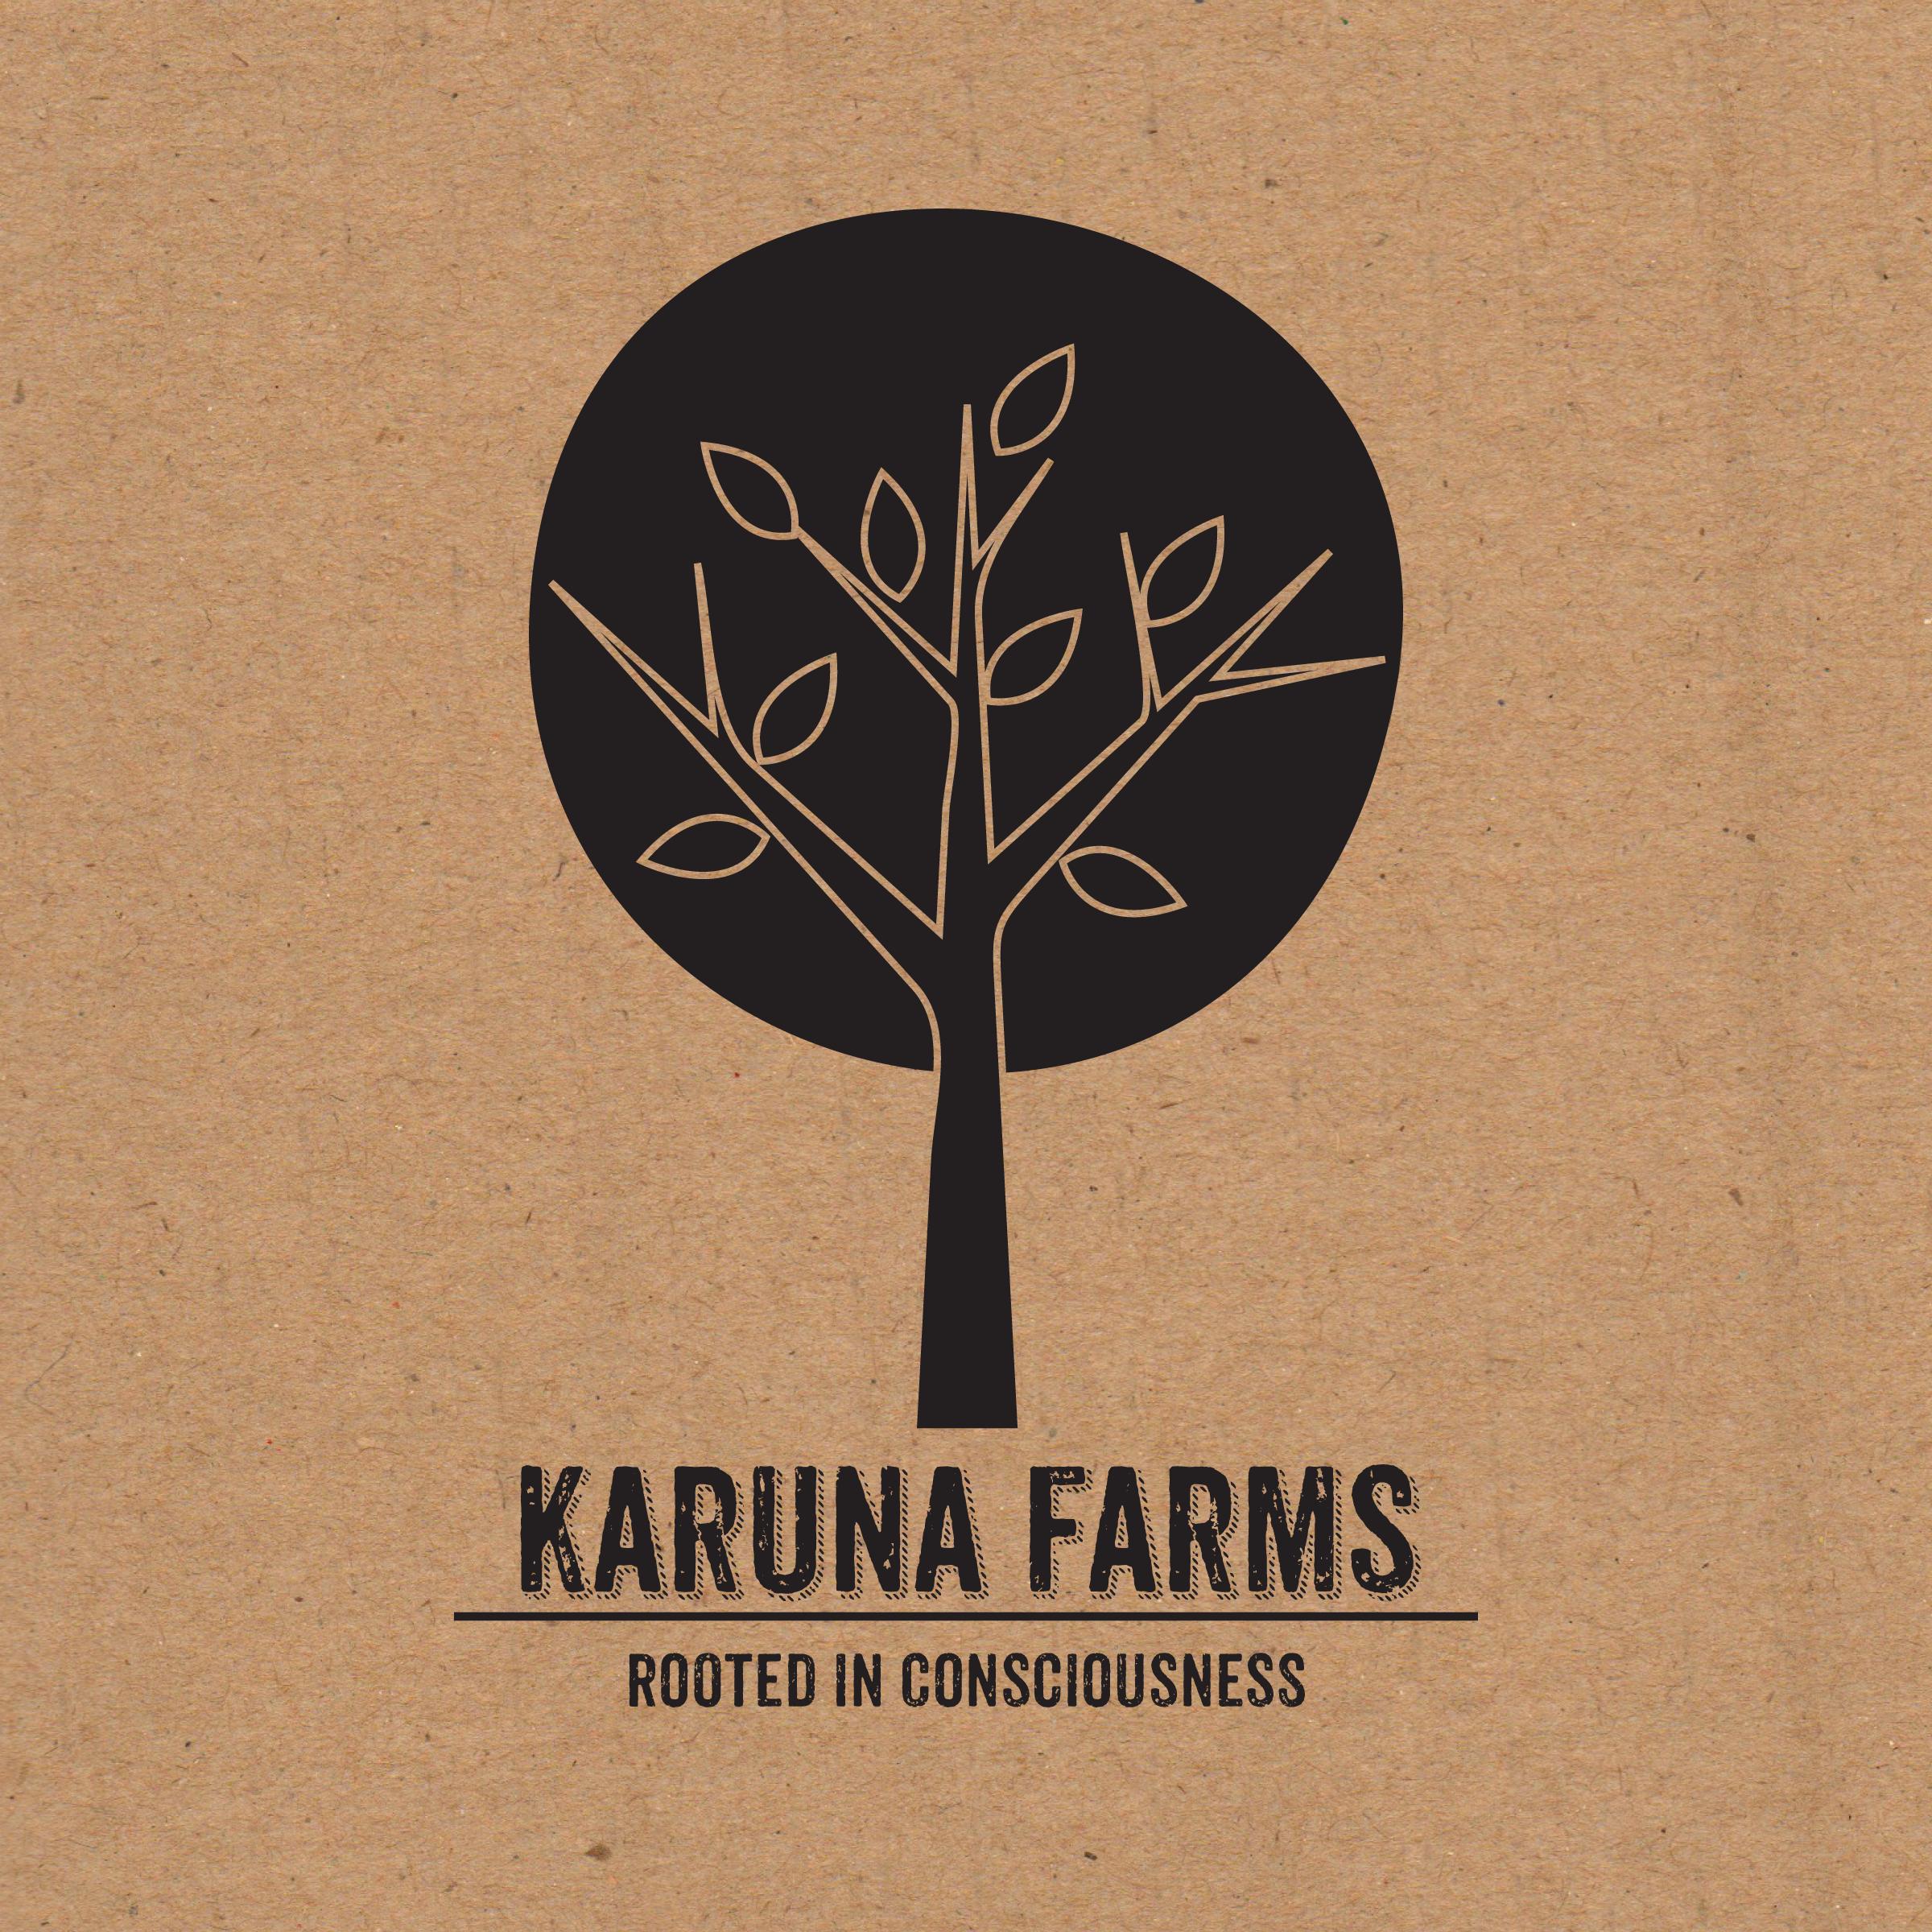 Karuna-Farms-Logo-2-5.png